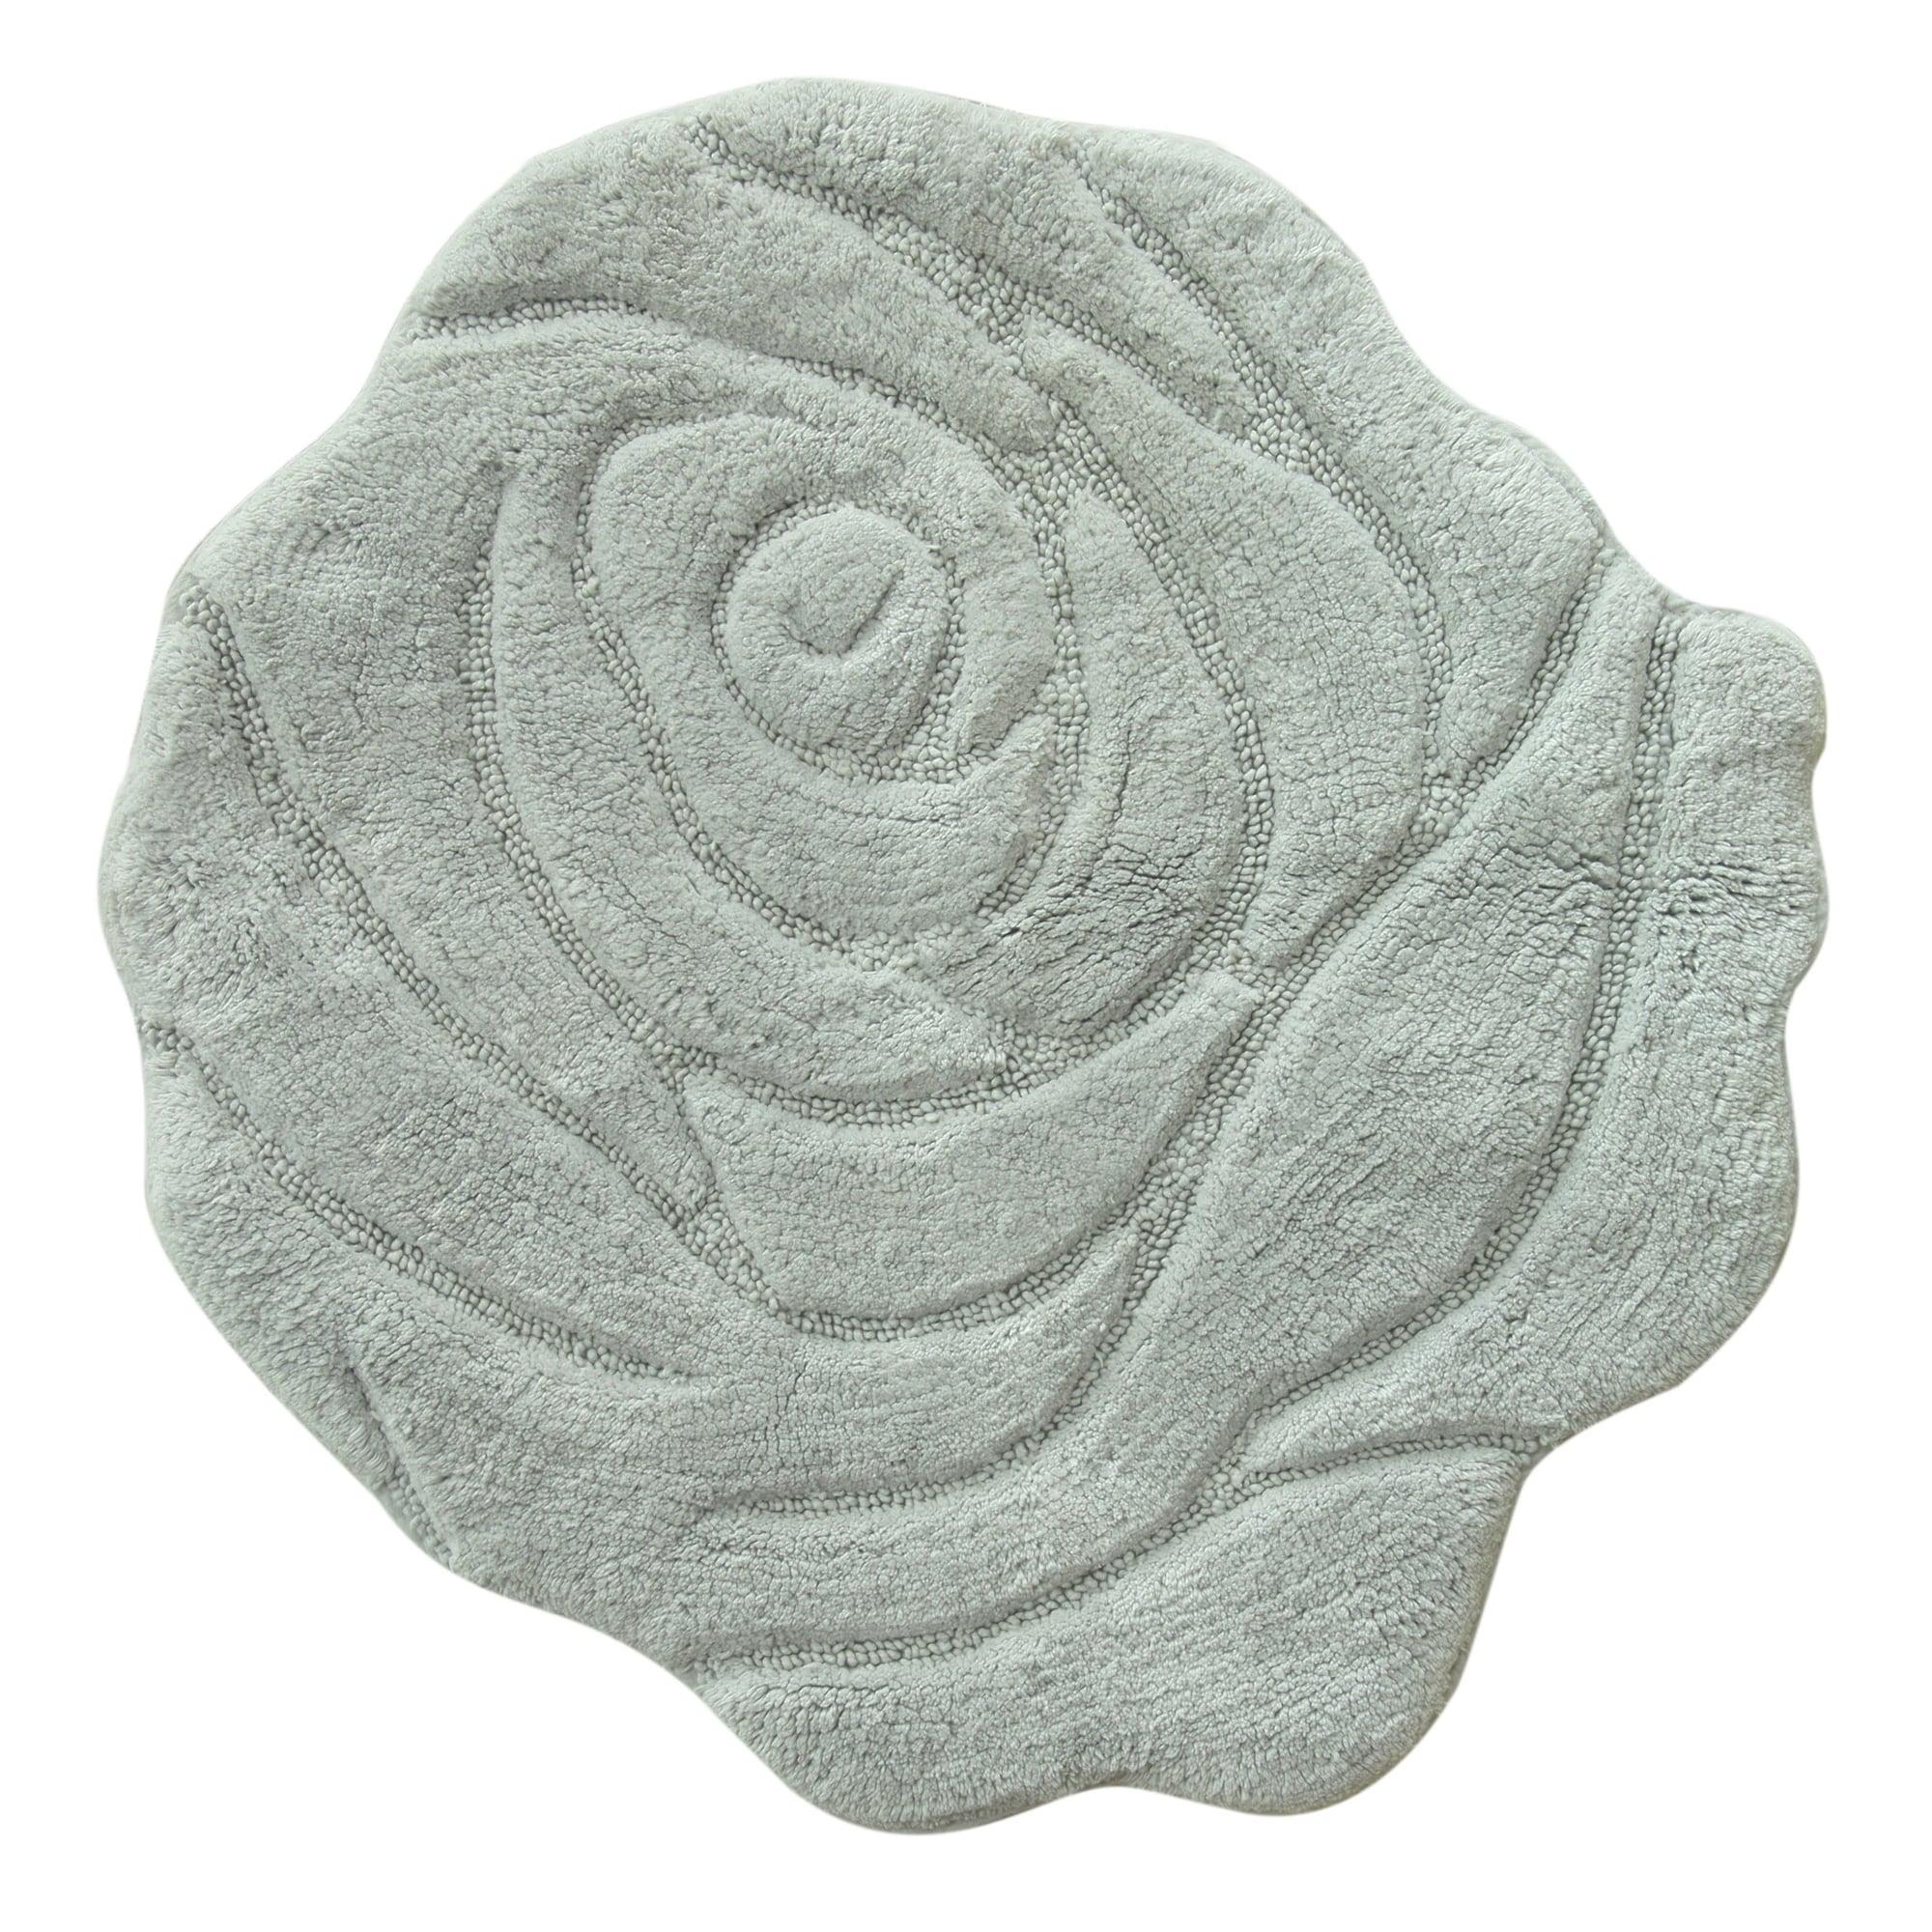 Jessica Simpson Naomi Floral Bath Rug (Grey), Size Round